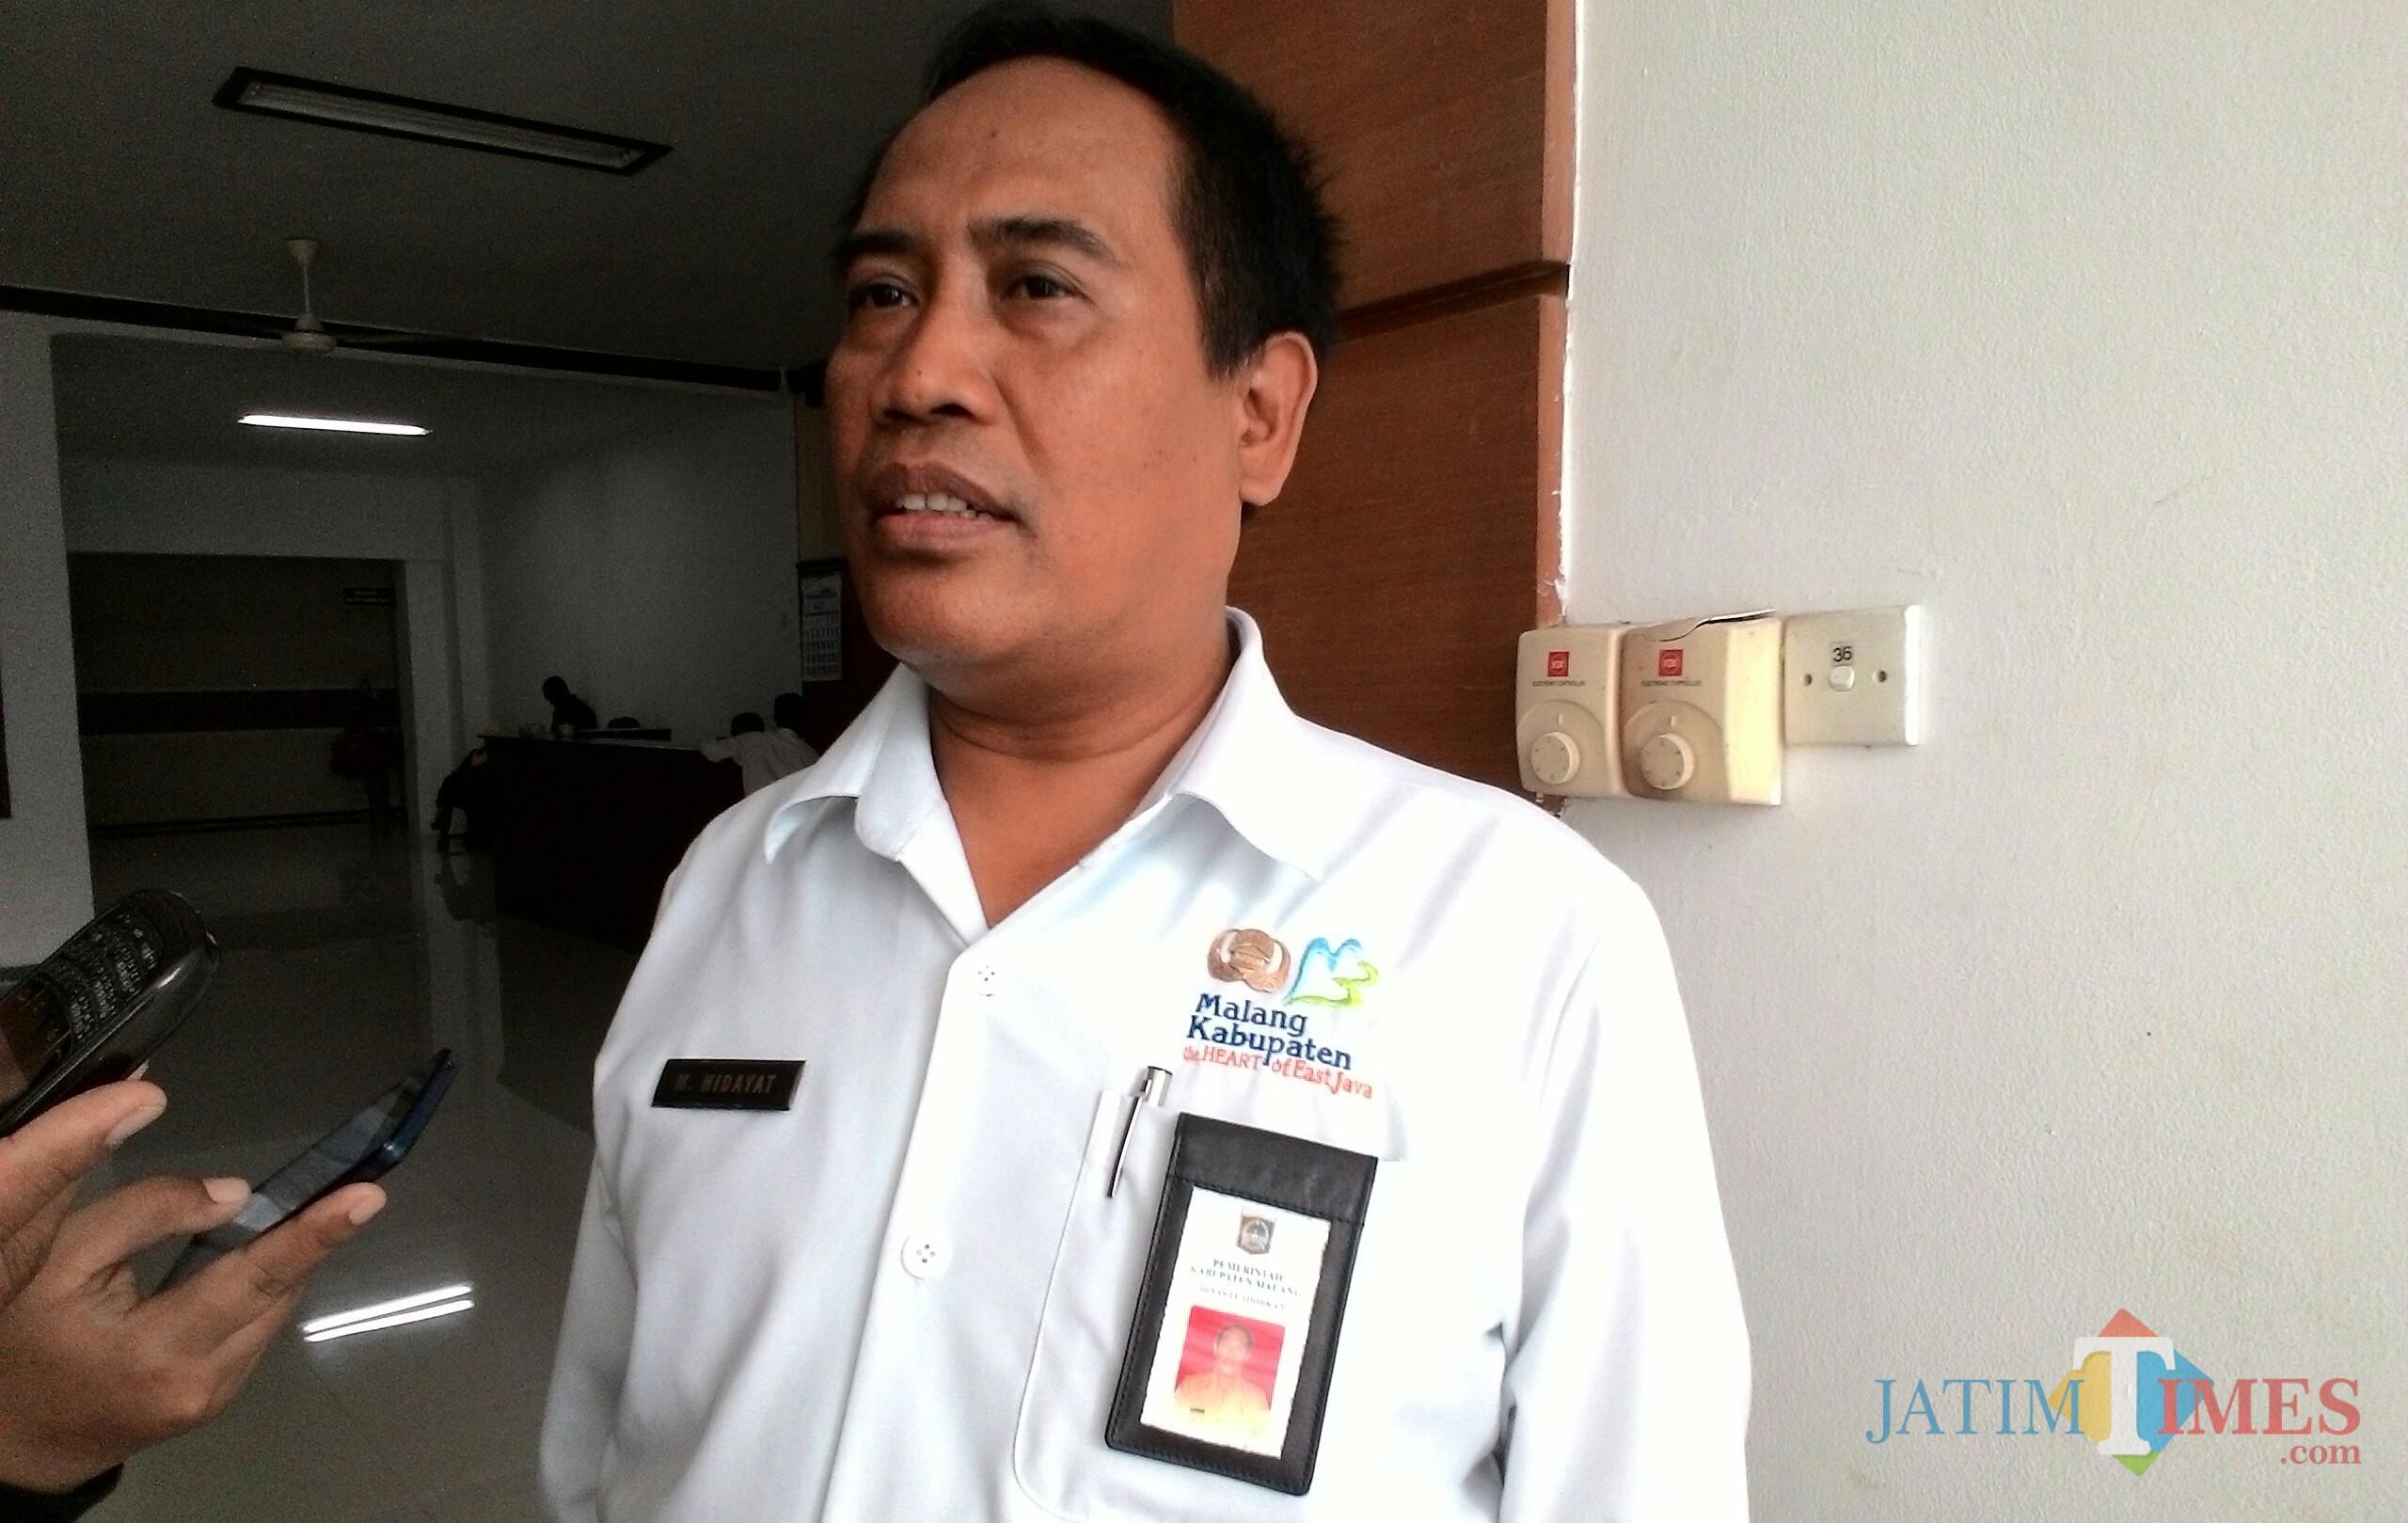 Kepala Dindik Kabupaten Malang M Hidayat menyampaikan pihaknya akan tingkatkan kualitas pendidikan dengan mengoptimalkan penggunaan teknologi digital (Nana)